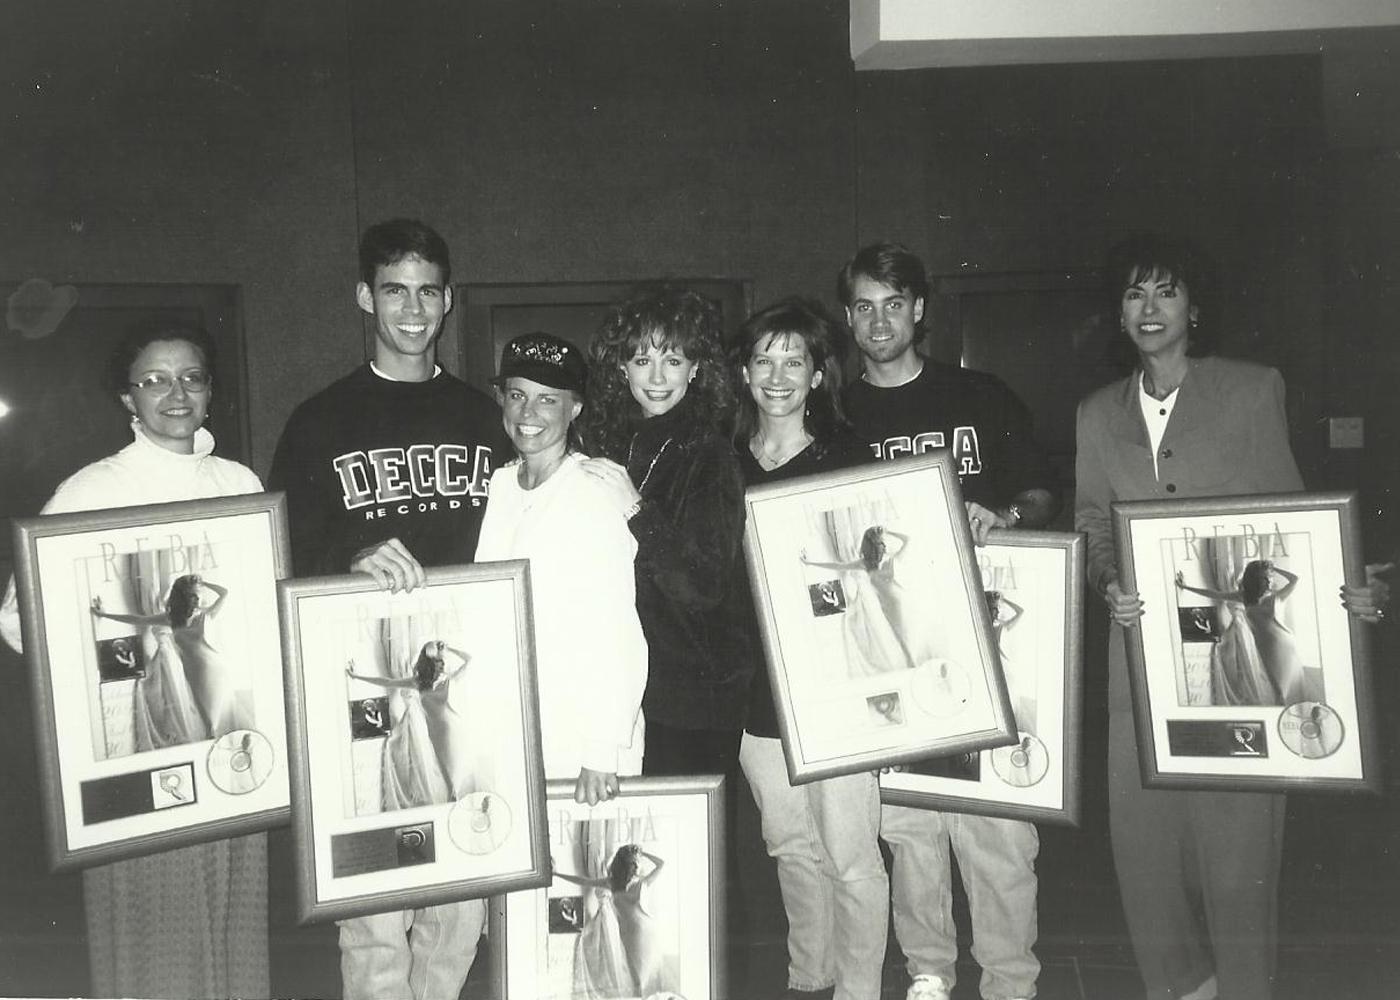 MCA with Reba McEntire